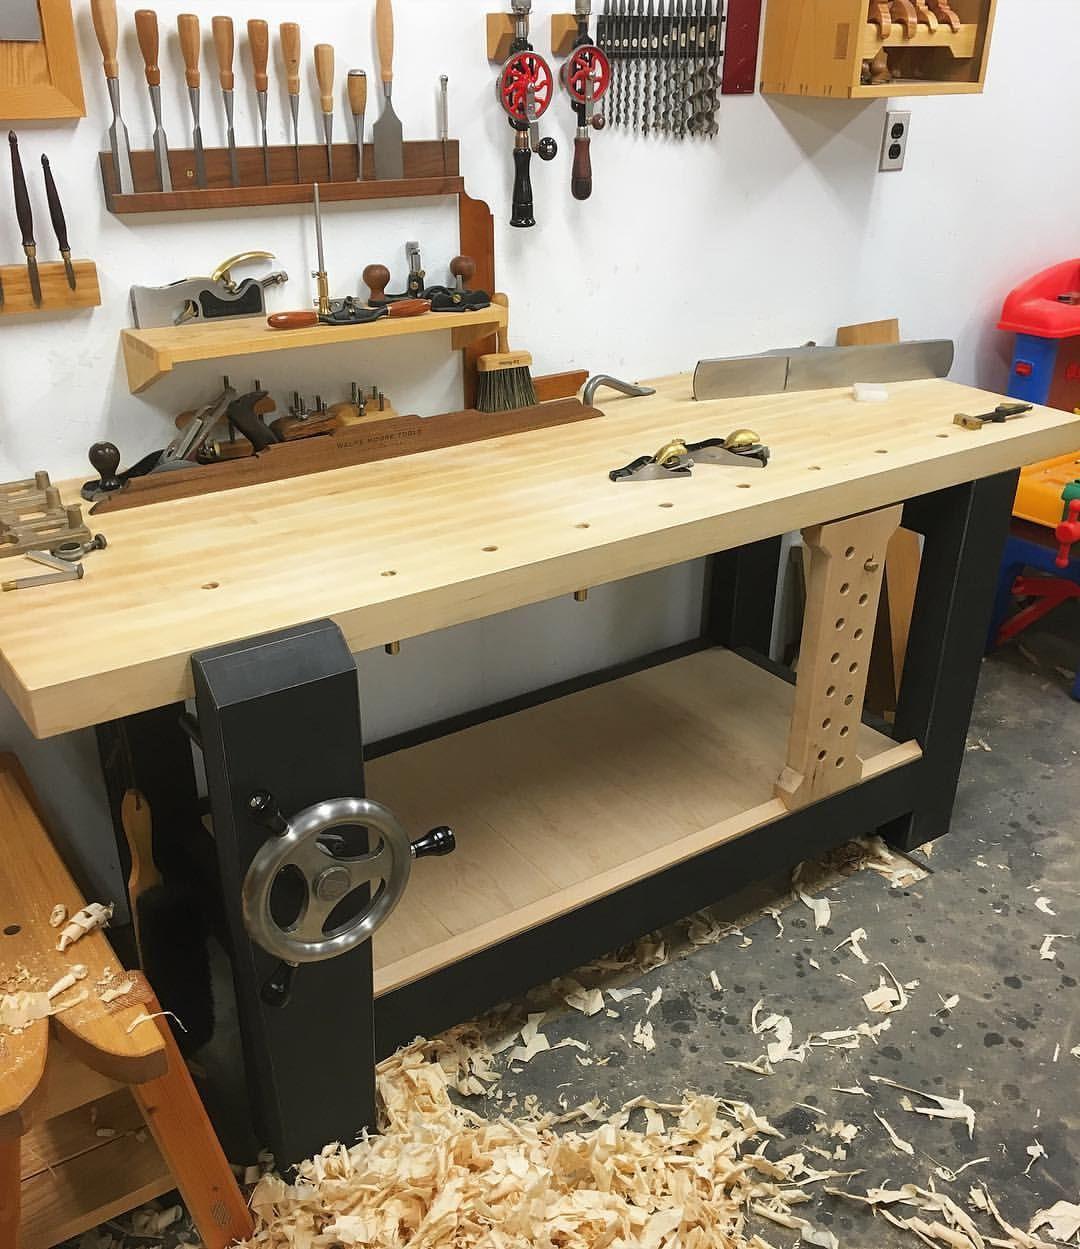 woodworking handtools woodwork workbench - Workbench Design Ideas